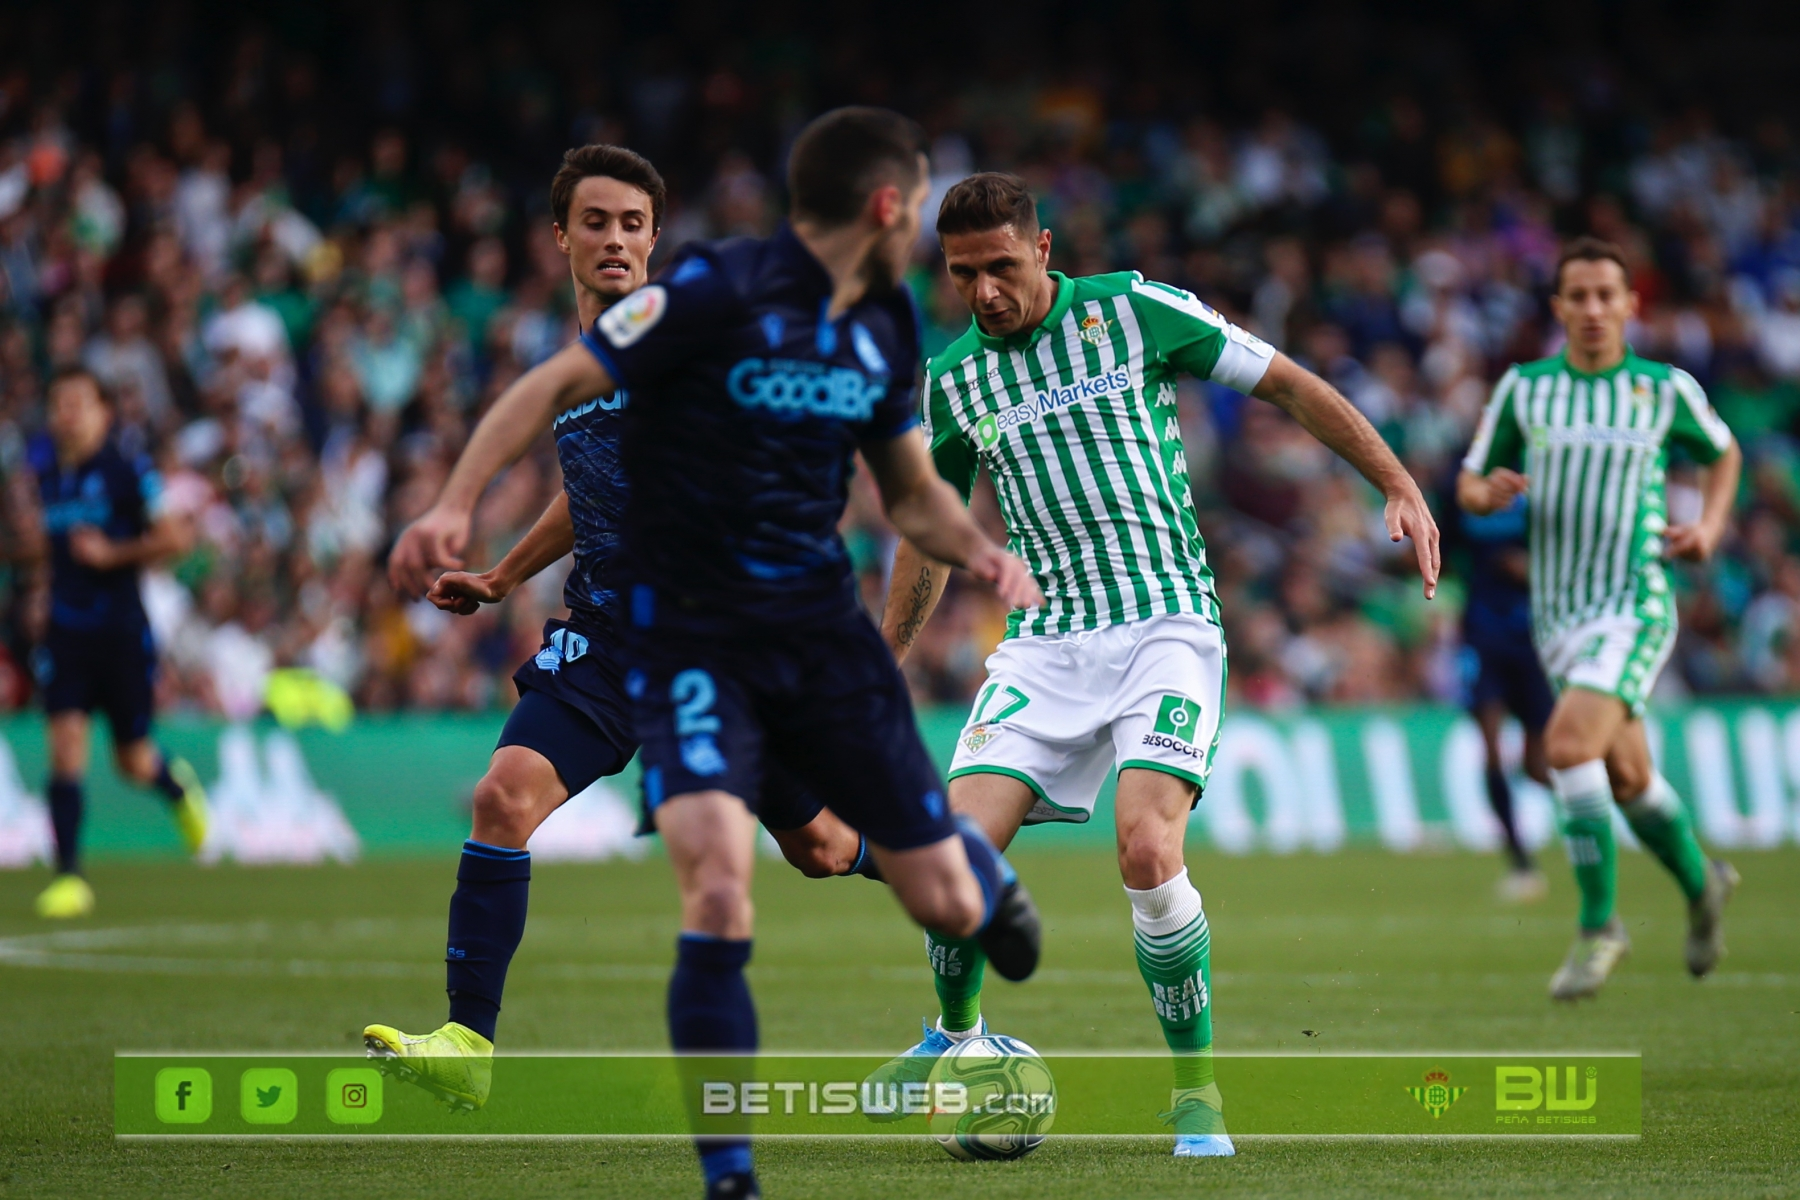 J20 Real Betis - Real Sociedad 38